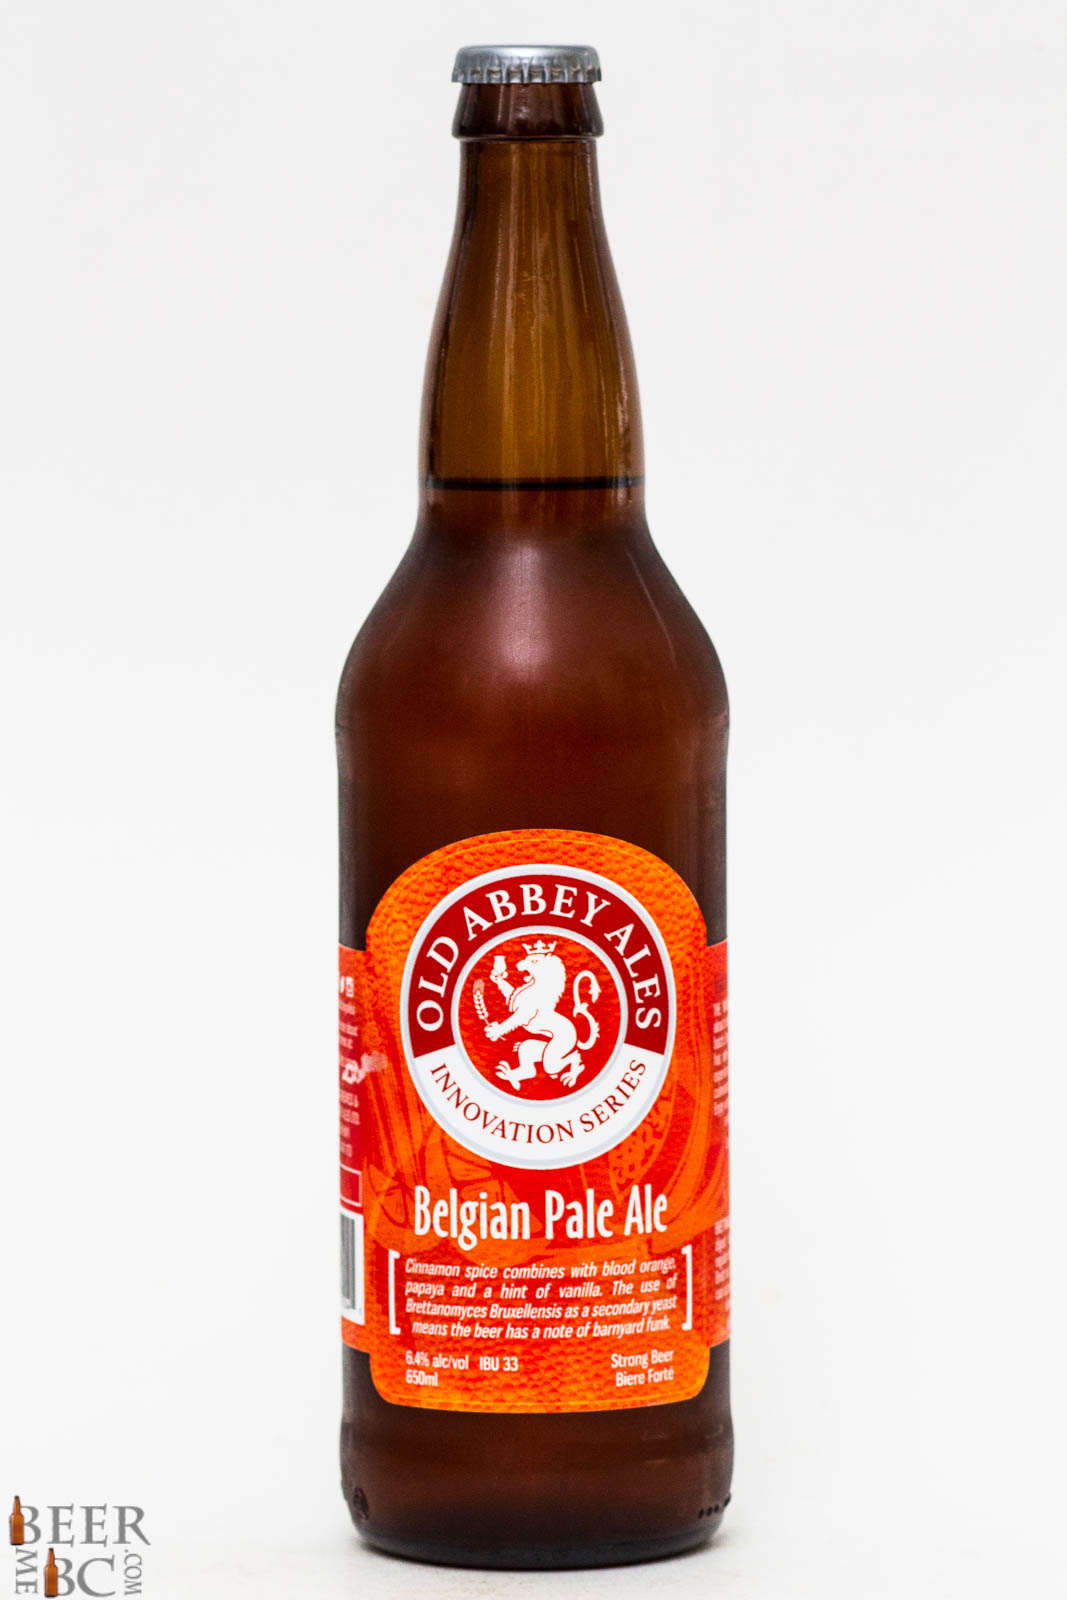 Old Abbey Ales Belgian Pale Ale Beer Me British Columbia